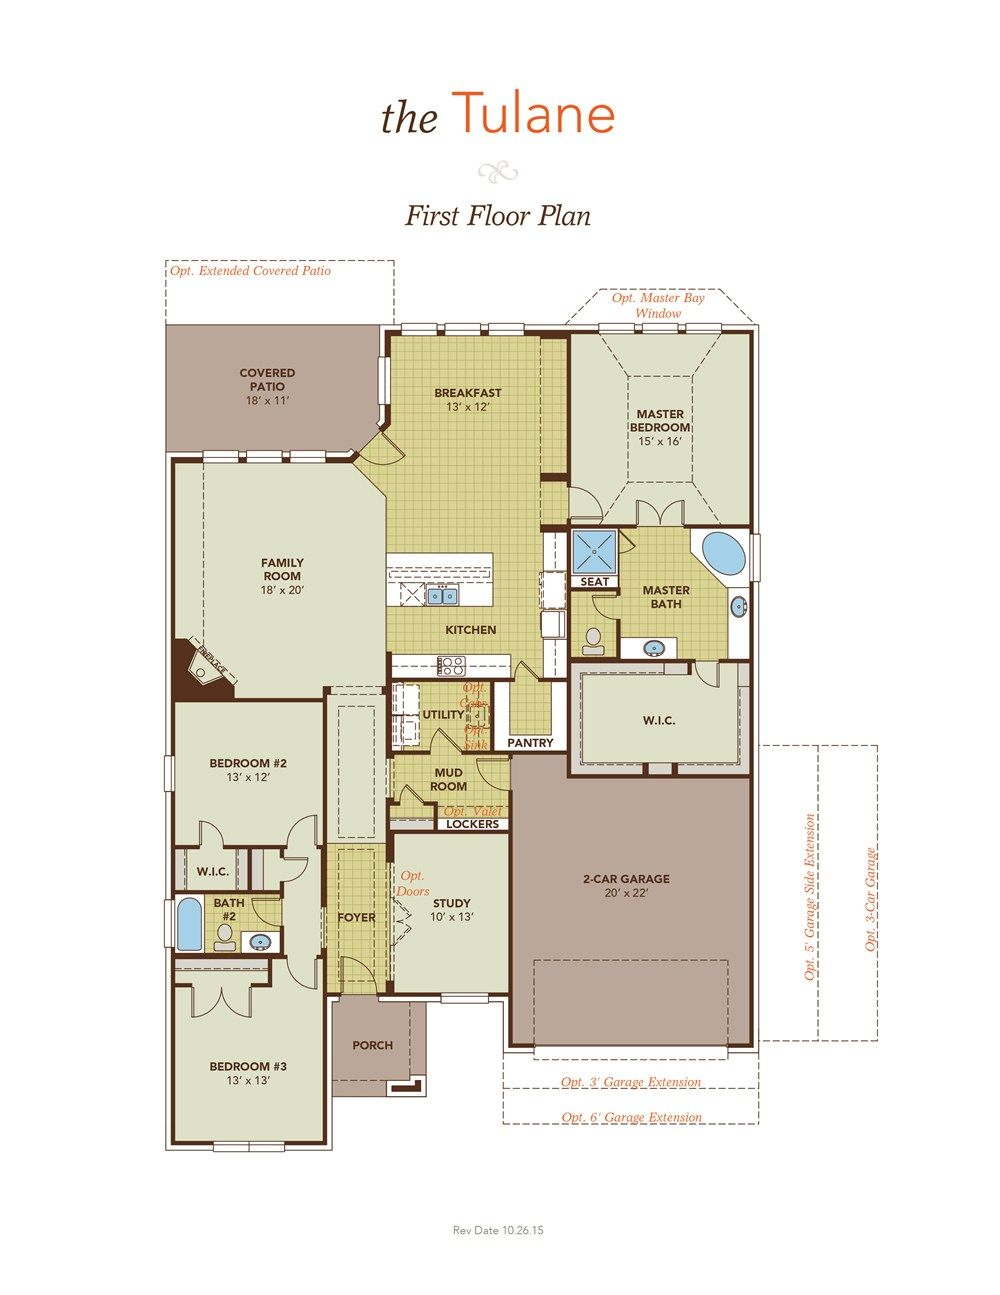 tulane first floor plan floor plans pinterest ranch patios